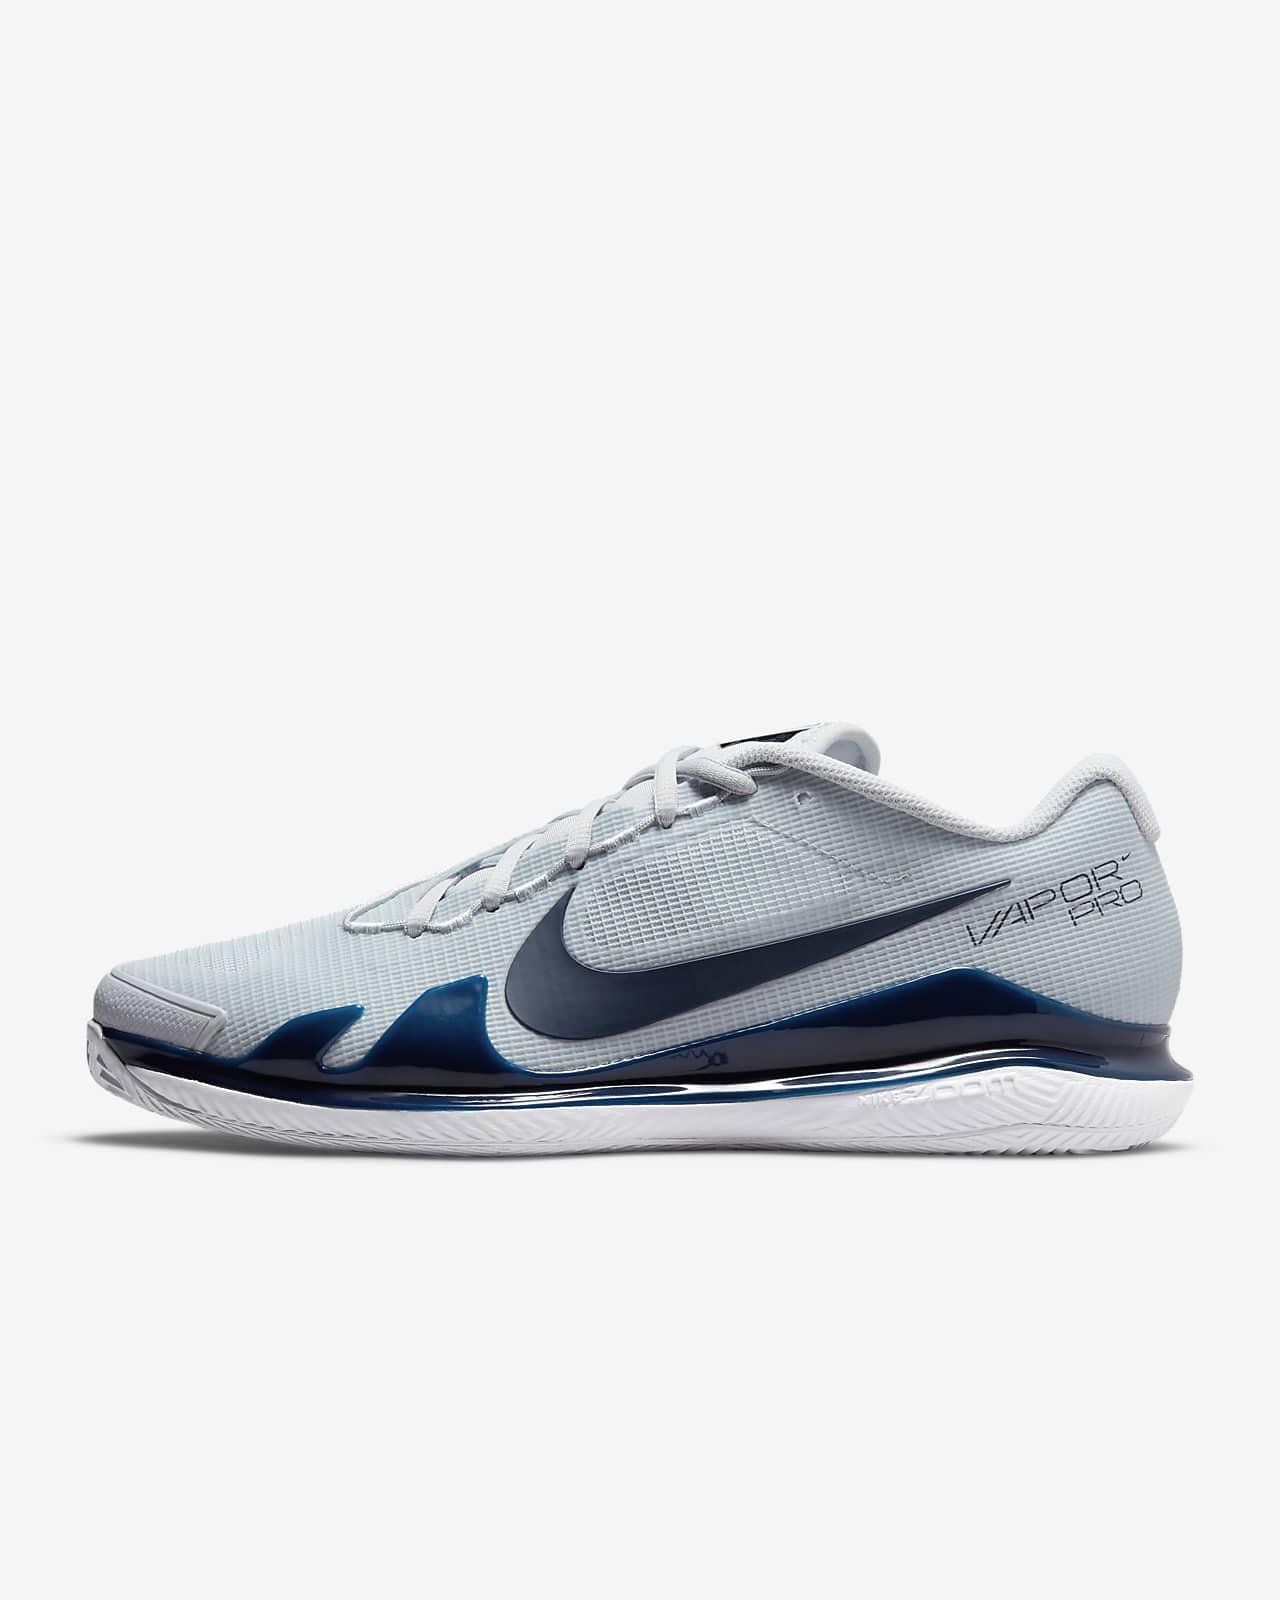 NikeCourt Air Zoom Vapor Pro Men's Clay Court Tennis Shoes. Nike LU